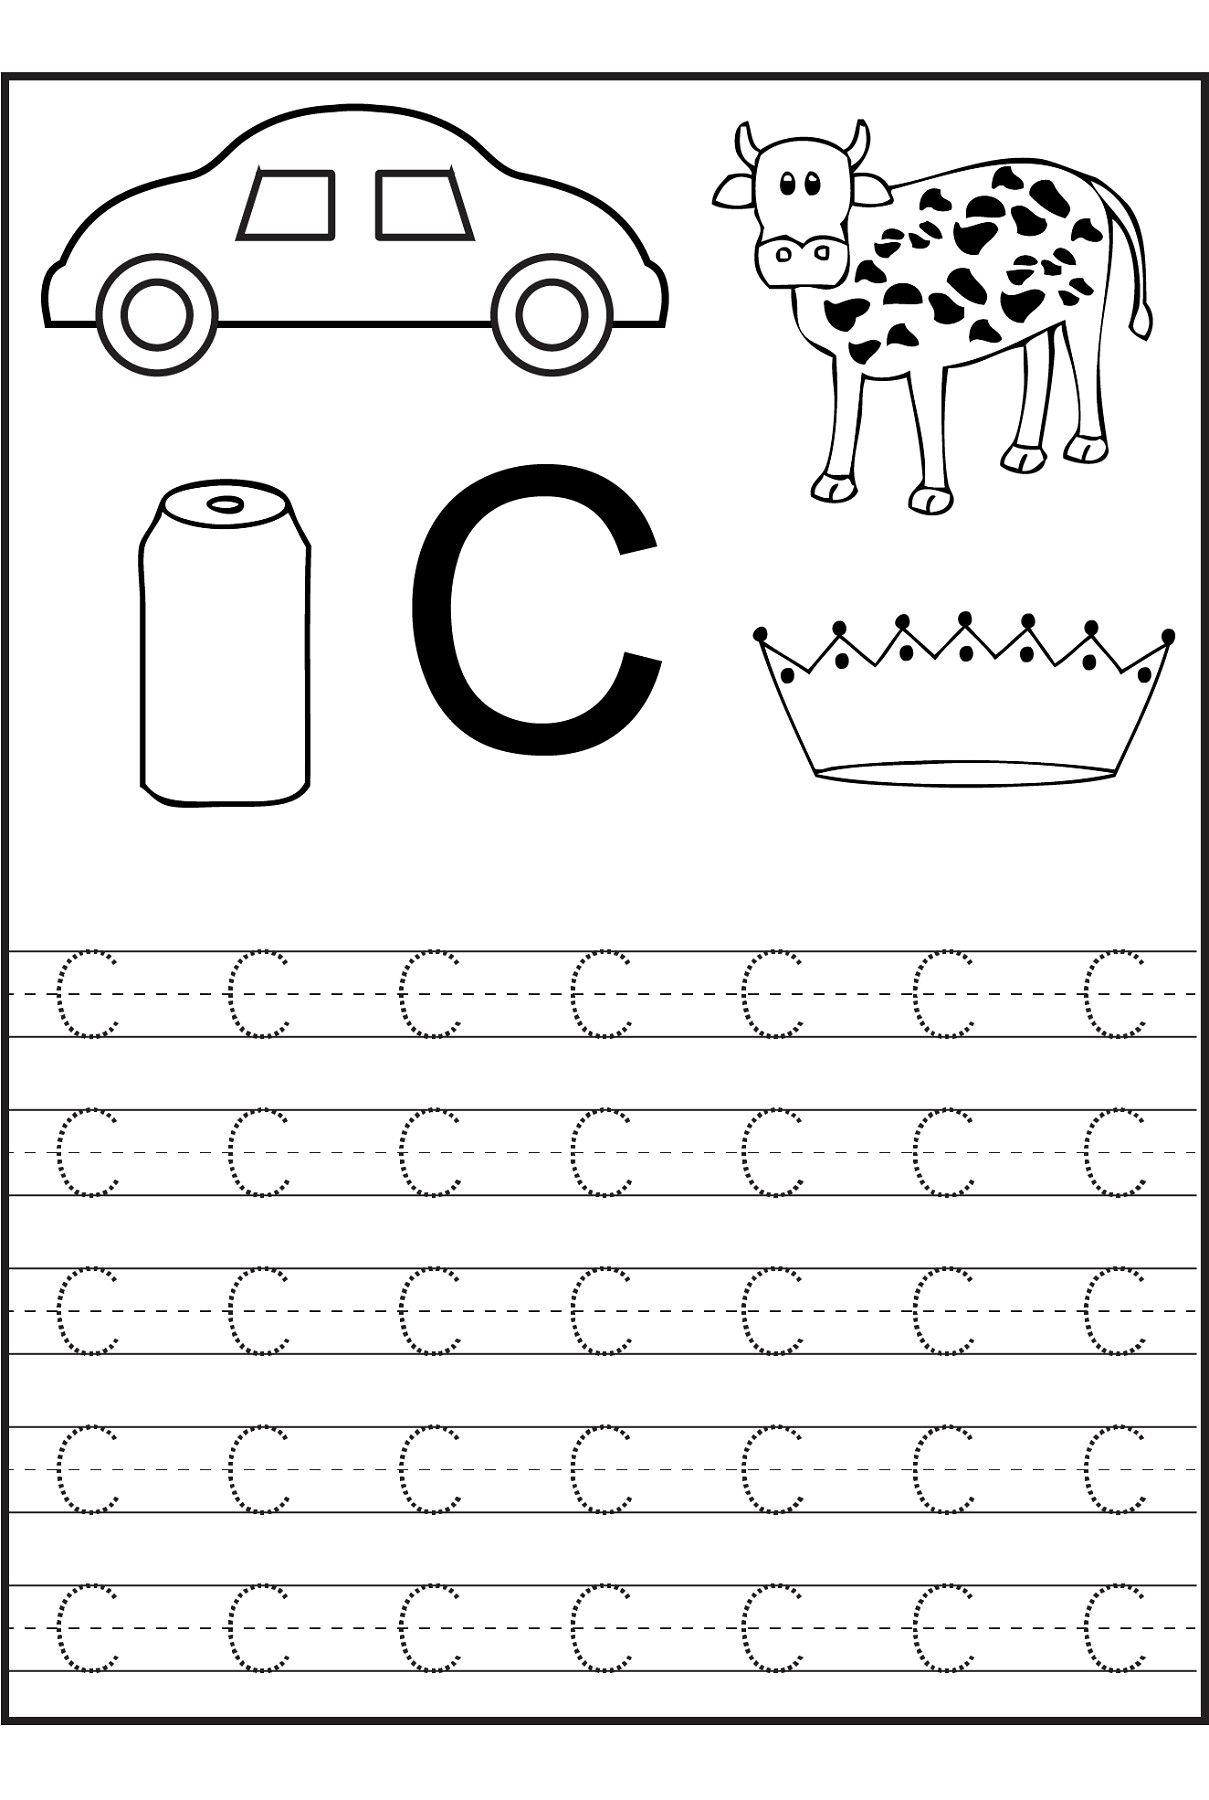 5 Traceable Alphabet Worksheets A Z Printable 001 In 2020 Learning Worksheets Free Preschool Worksheets Preschool Worksheets